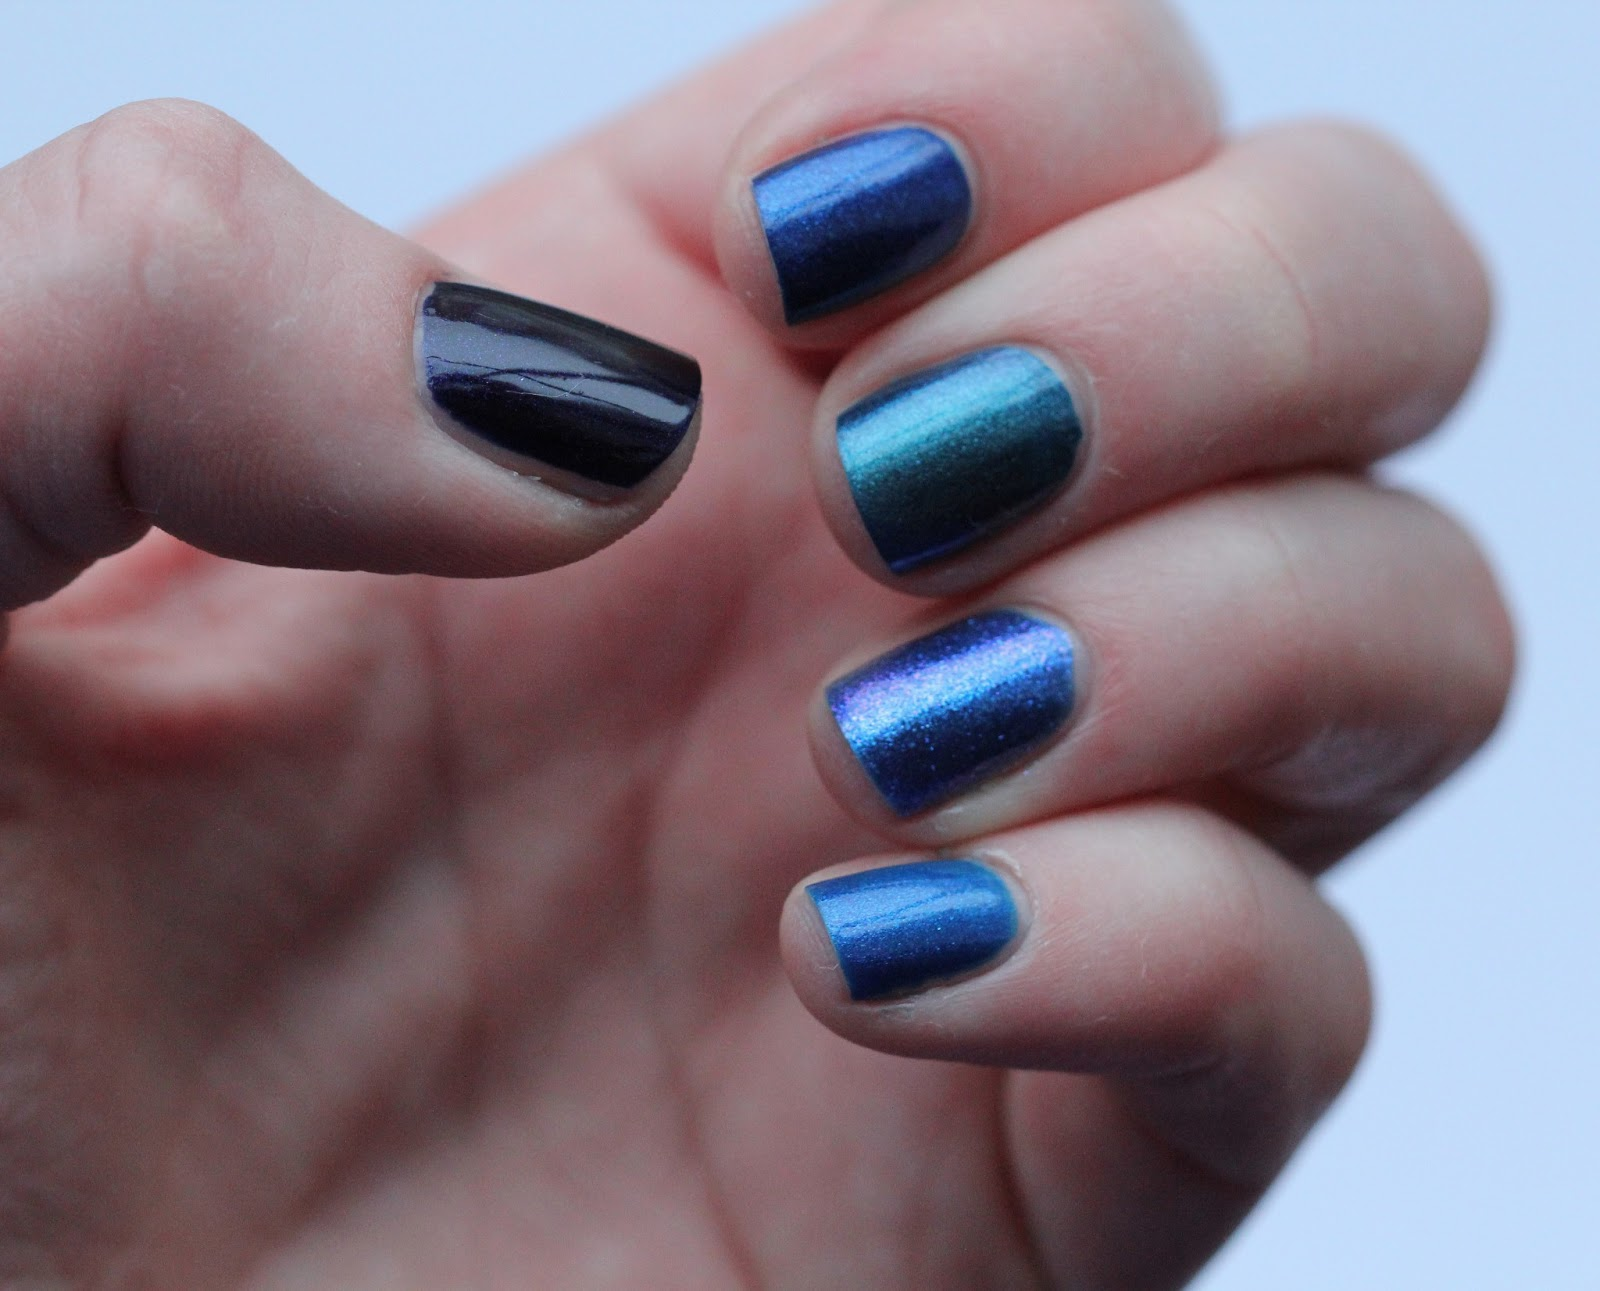 Blue ombre nails tumblr 4099538 - girlietalk.info